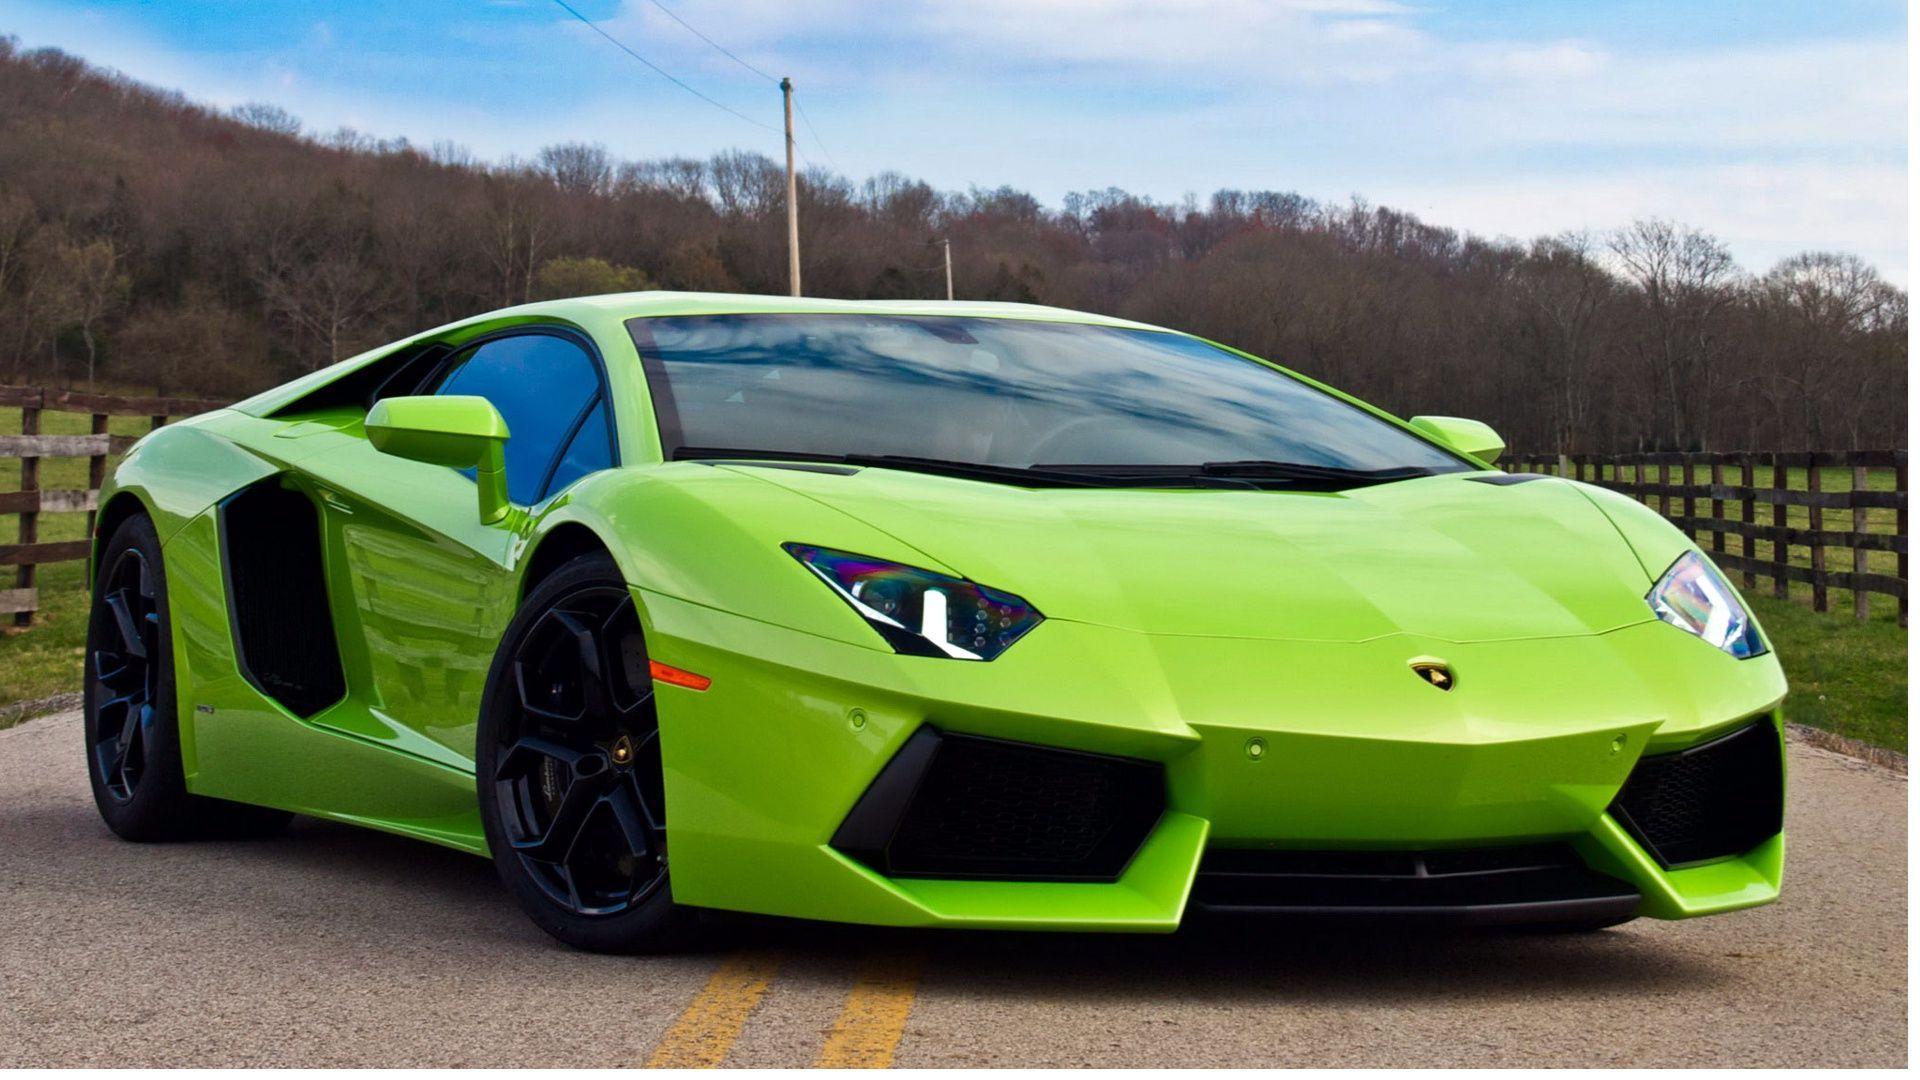 Green Lamborghini Wallpapers , Top Free Green Lamborghini